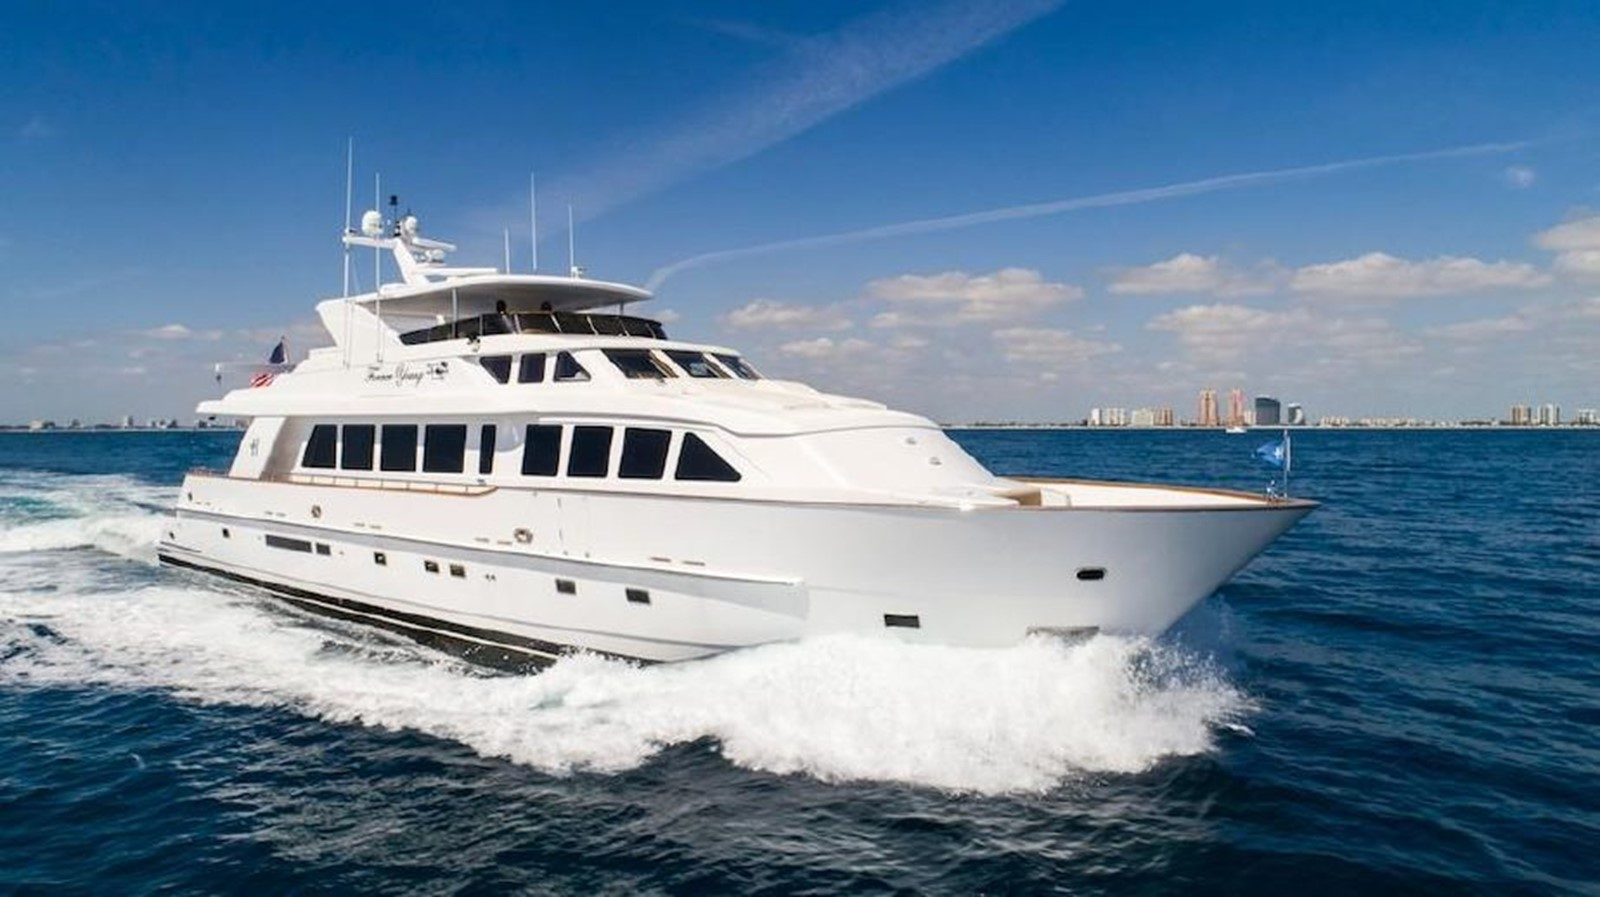 2003 HARGRAVE Cockpit Motor yacht For Sale